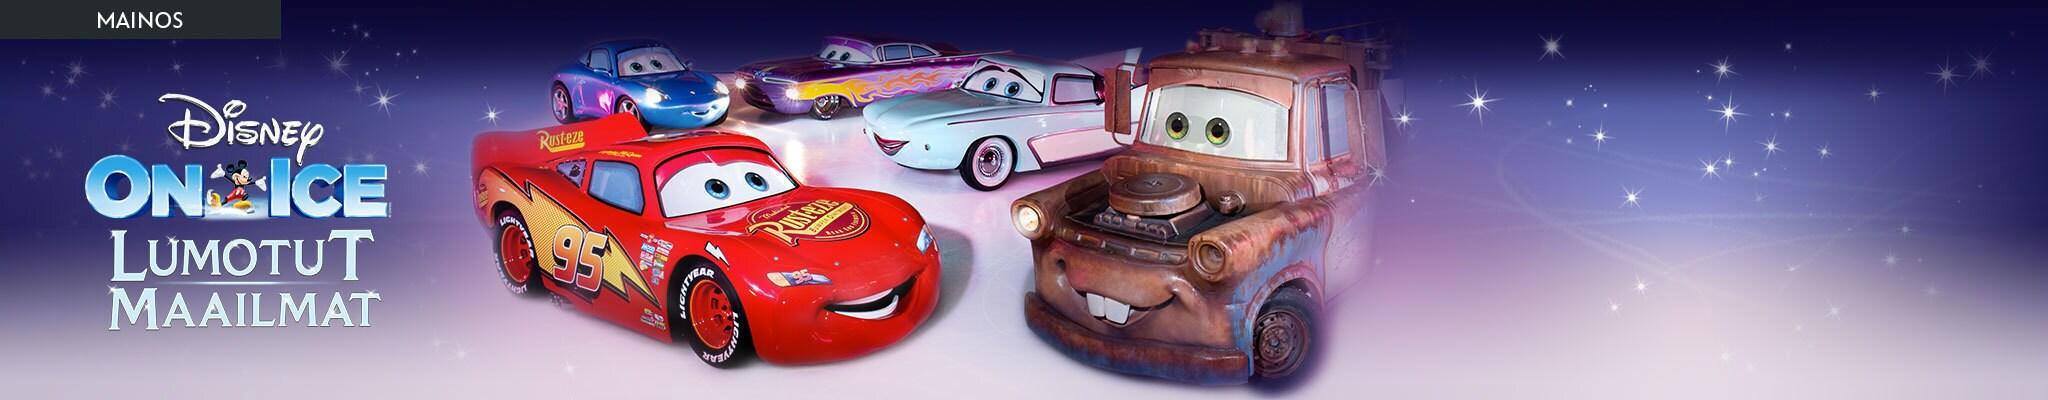 DOI - Worlds of Enchantment - Cars - Short Hero